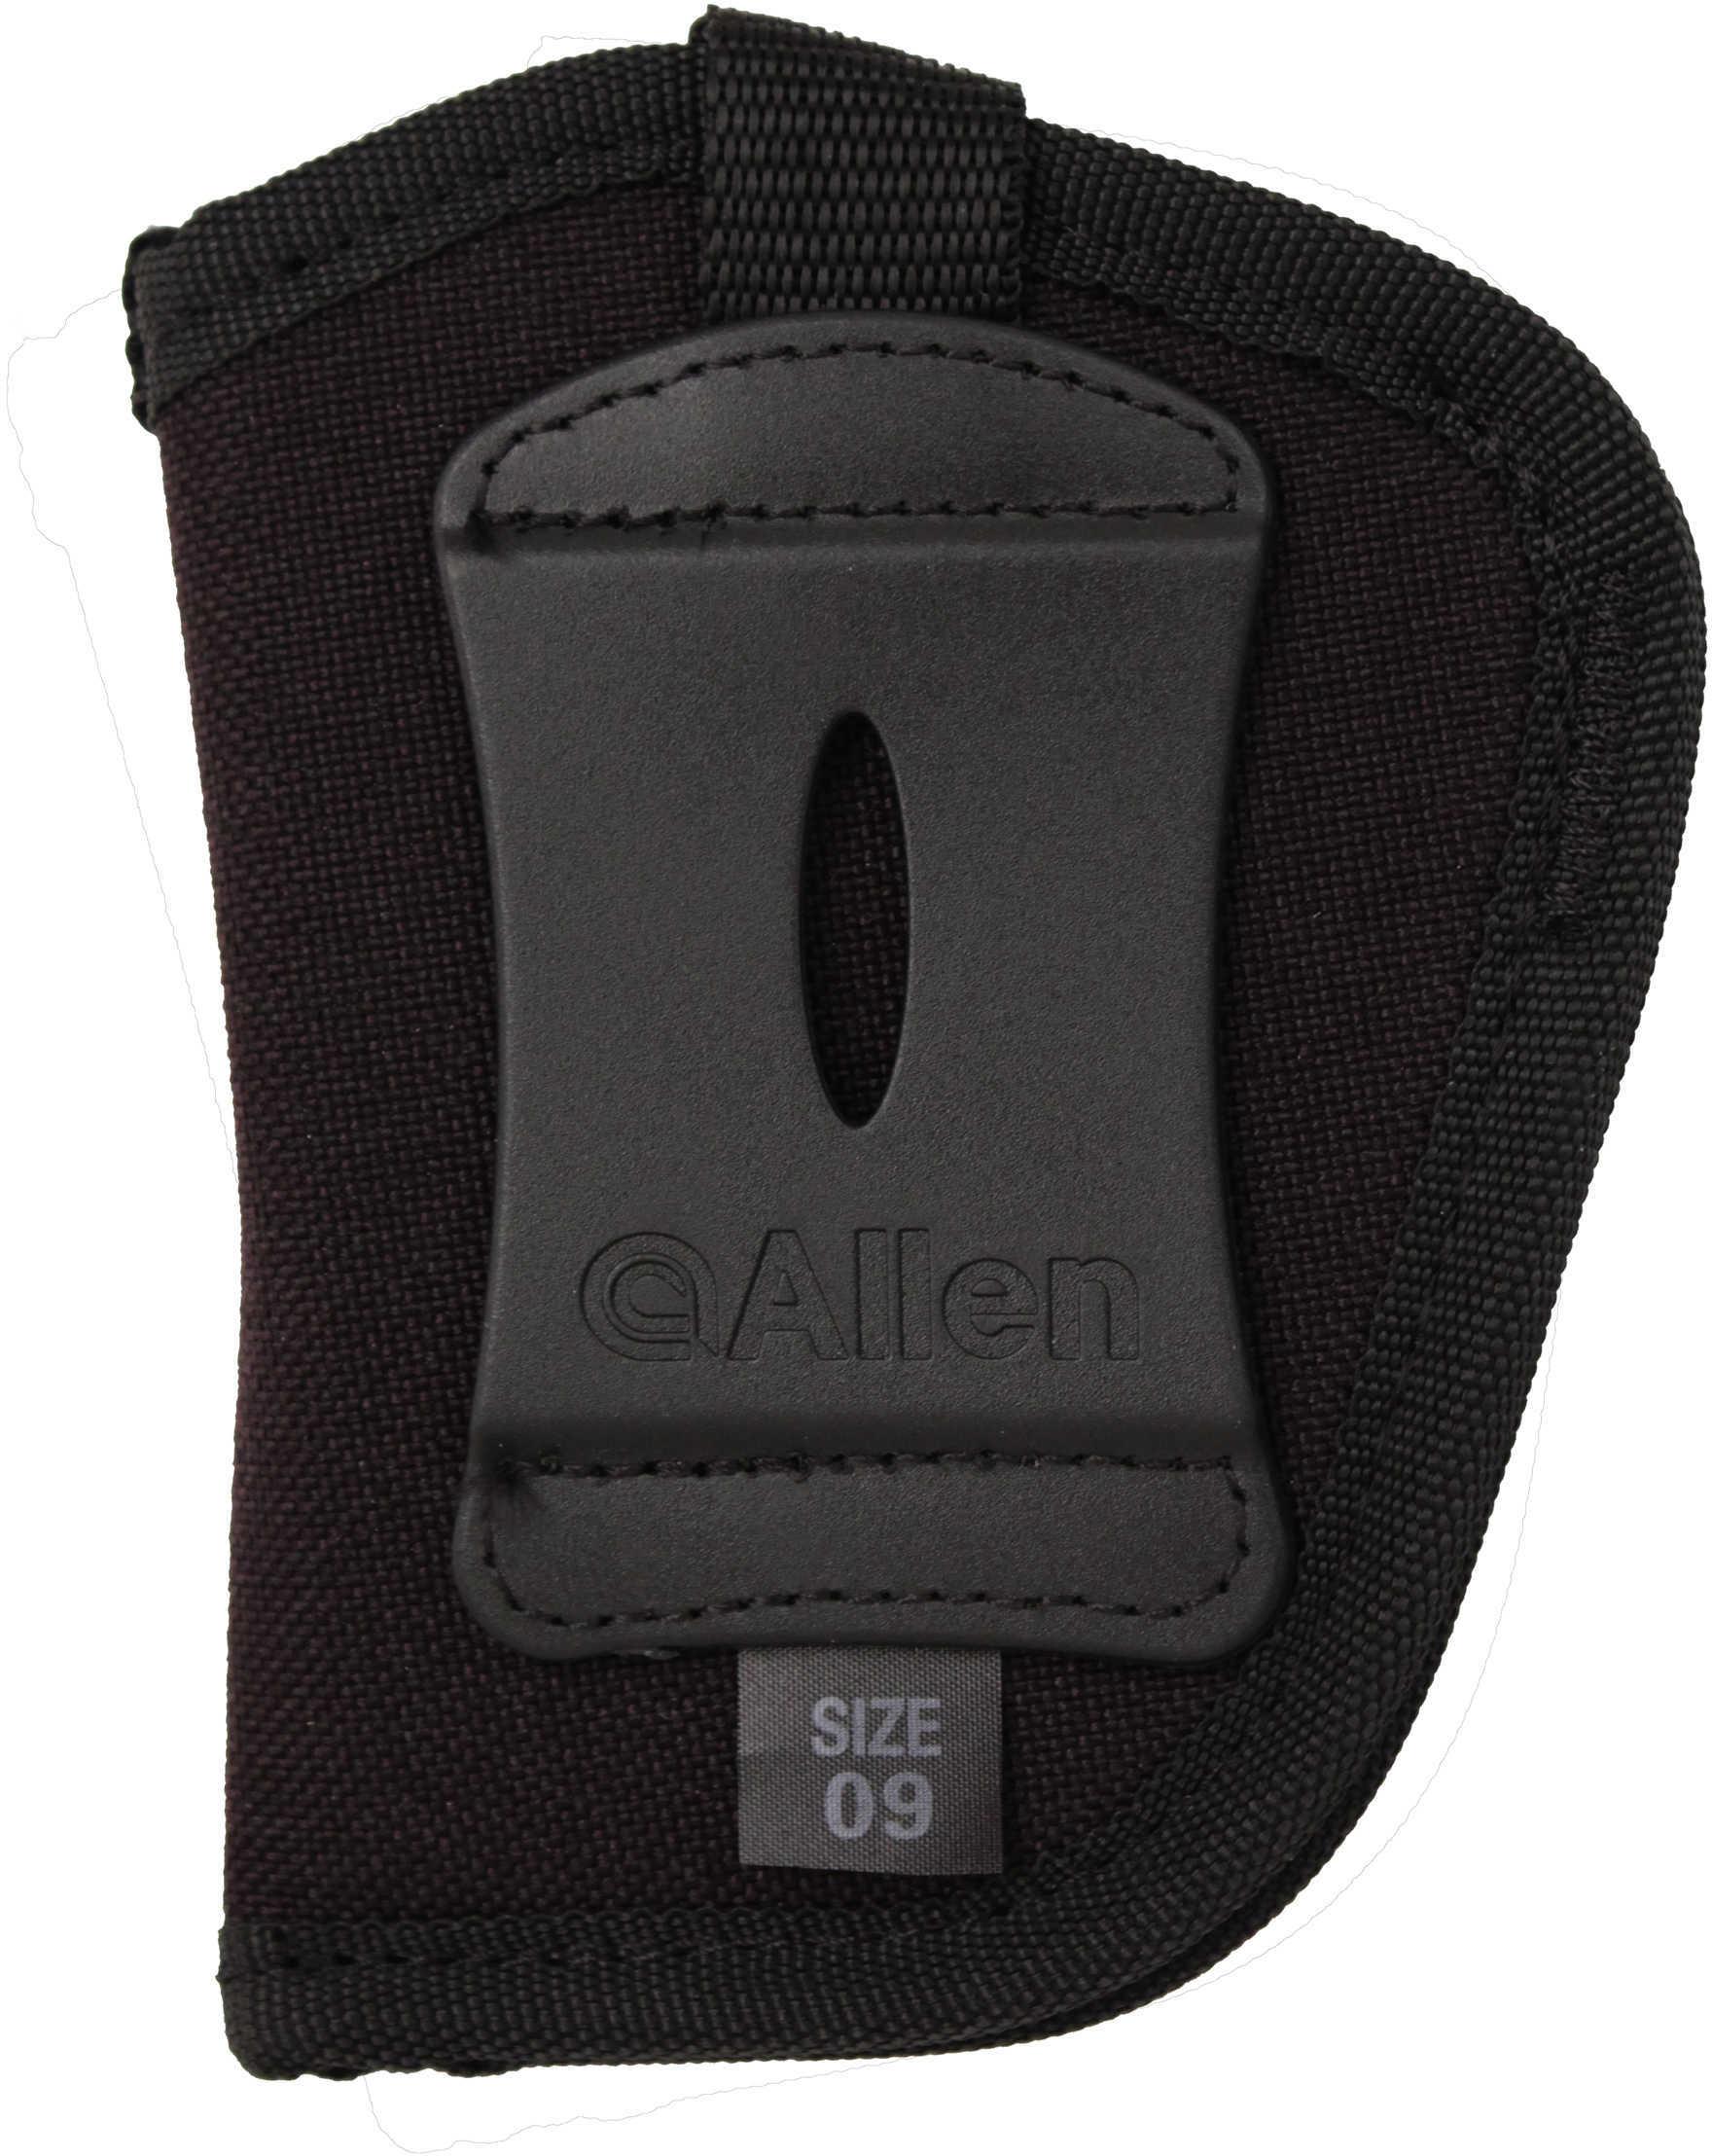 Allen Cases Cortez Nylon Pistol Holster, Black Size 9 44809